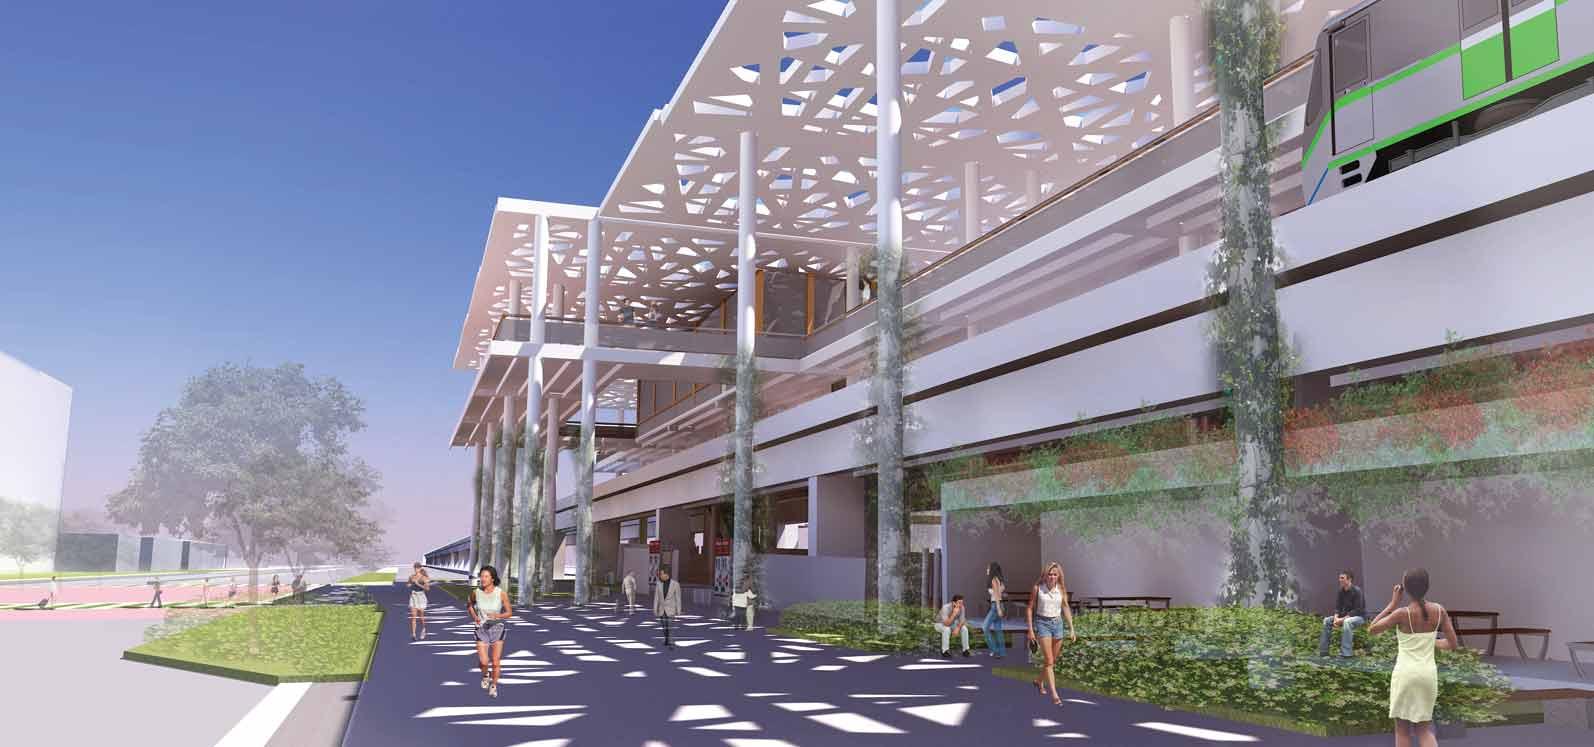 Will Miami's Metrorail shade a linear park?